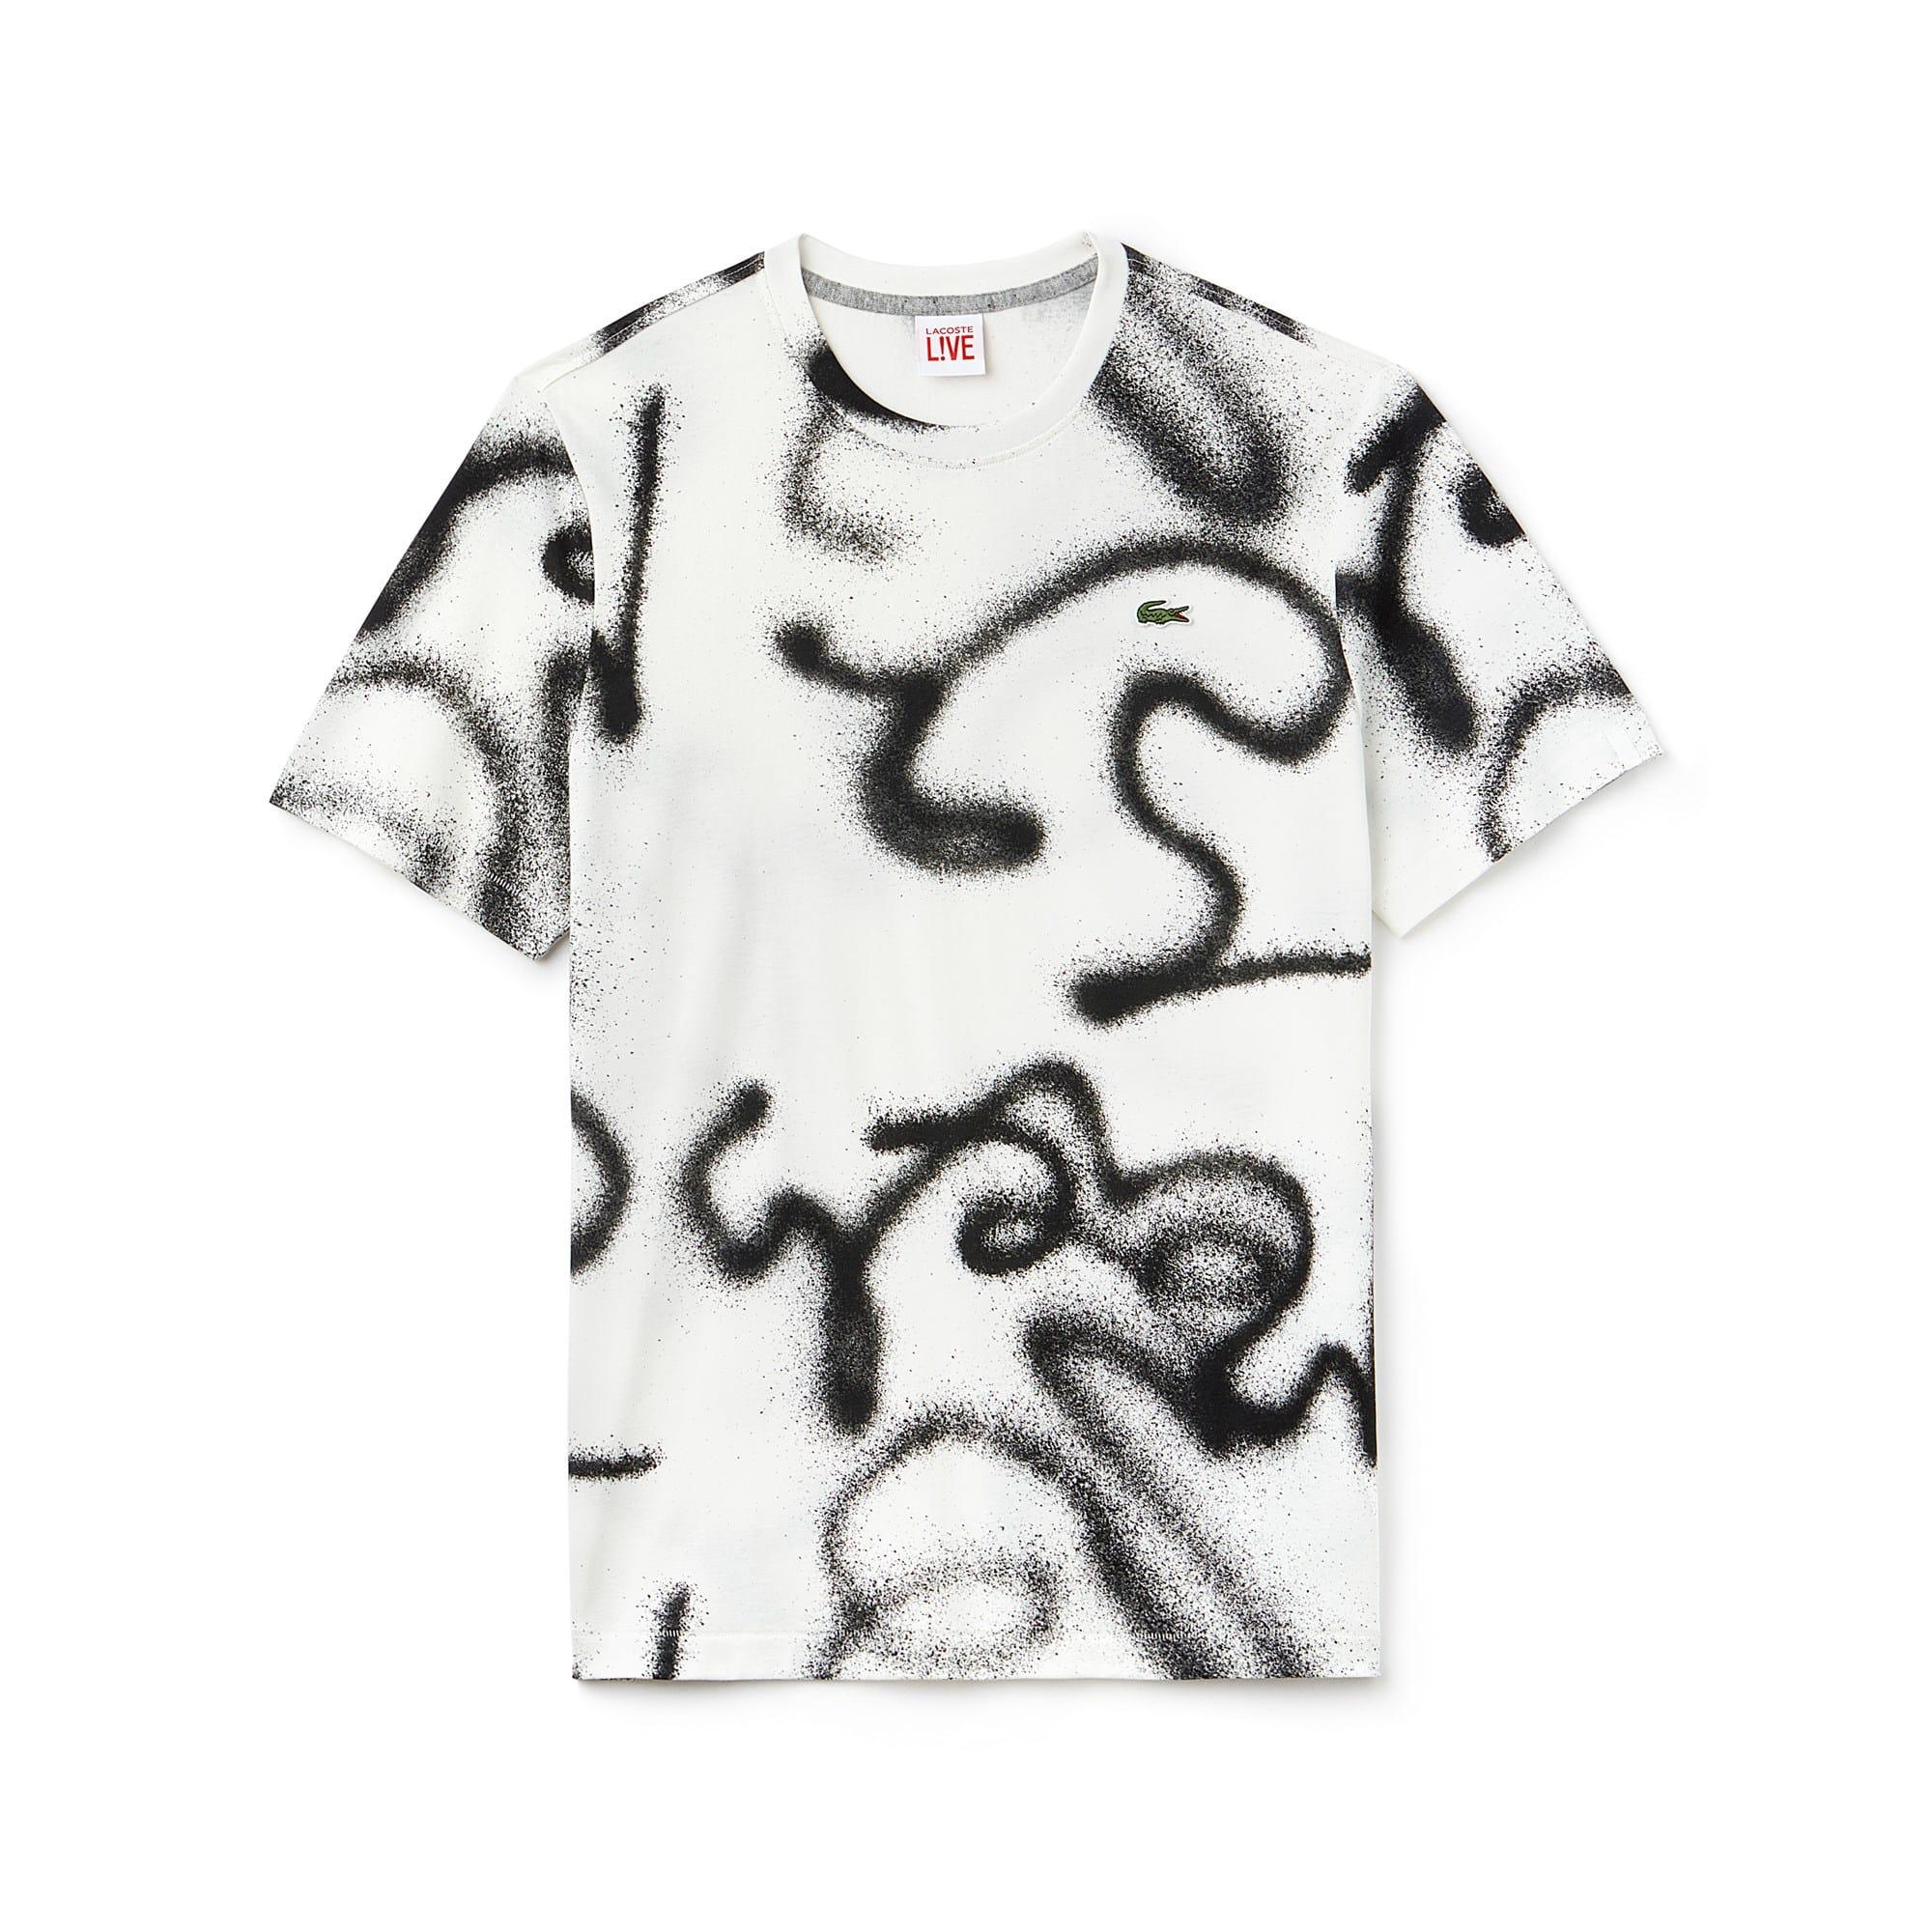 Men's Lacoste LIVE Crew Neck Graffiti Print Jersey T-shirt